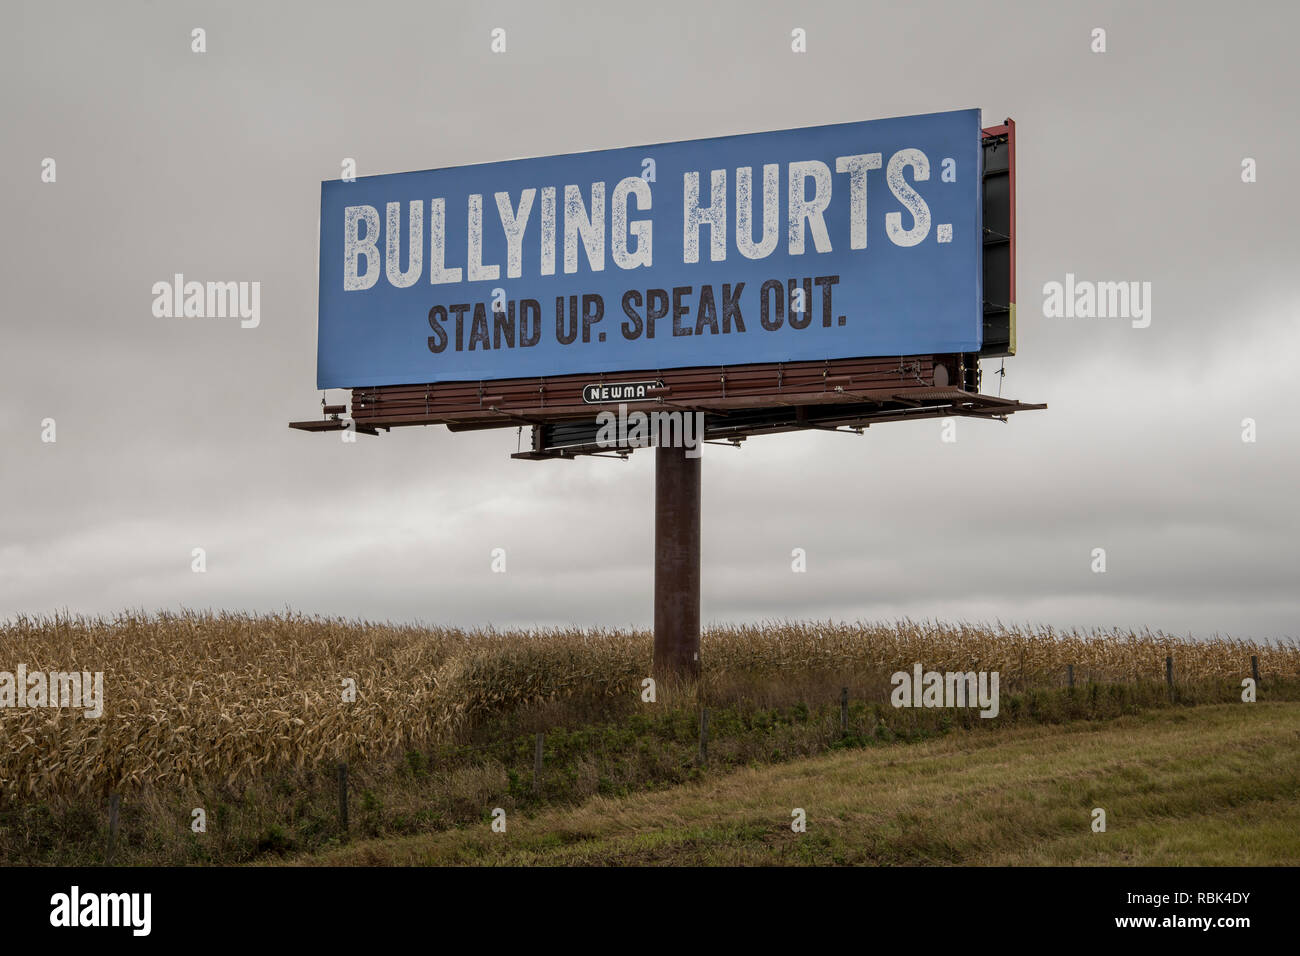 Brandon, Minnesota. Bullying hurts billboard sign. - Stock Image